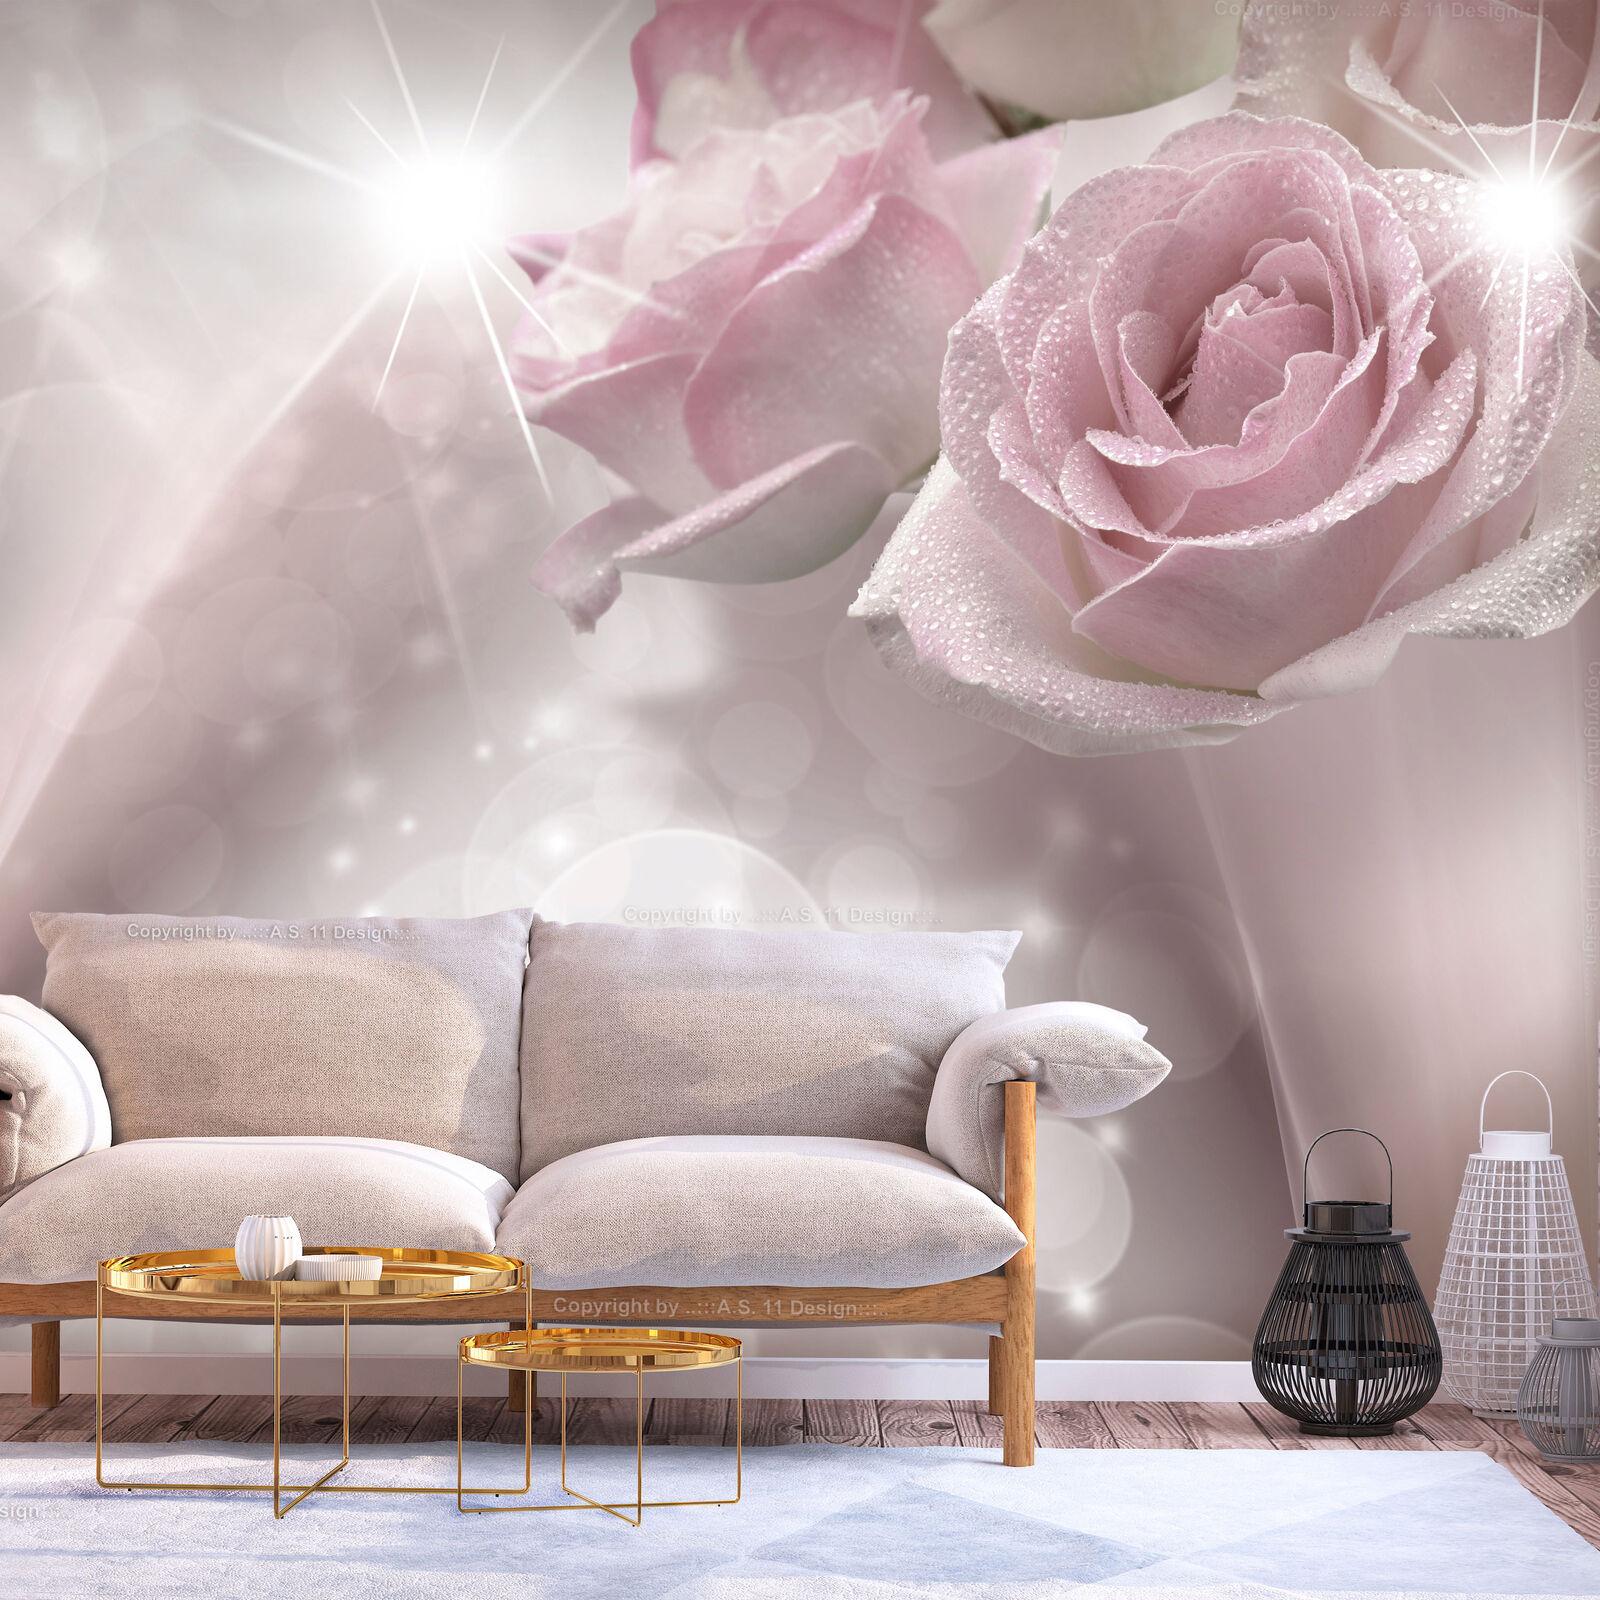 Photo Wallpaper Non-woven (fleece) Self-adhesive Foil pink Flowers b-C-0200-a-a